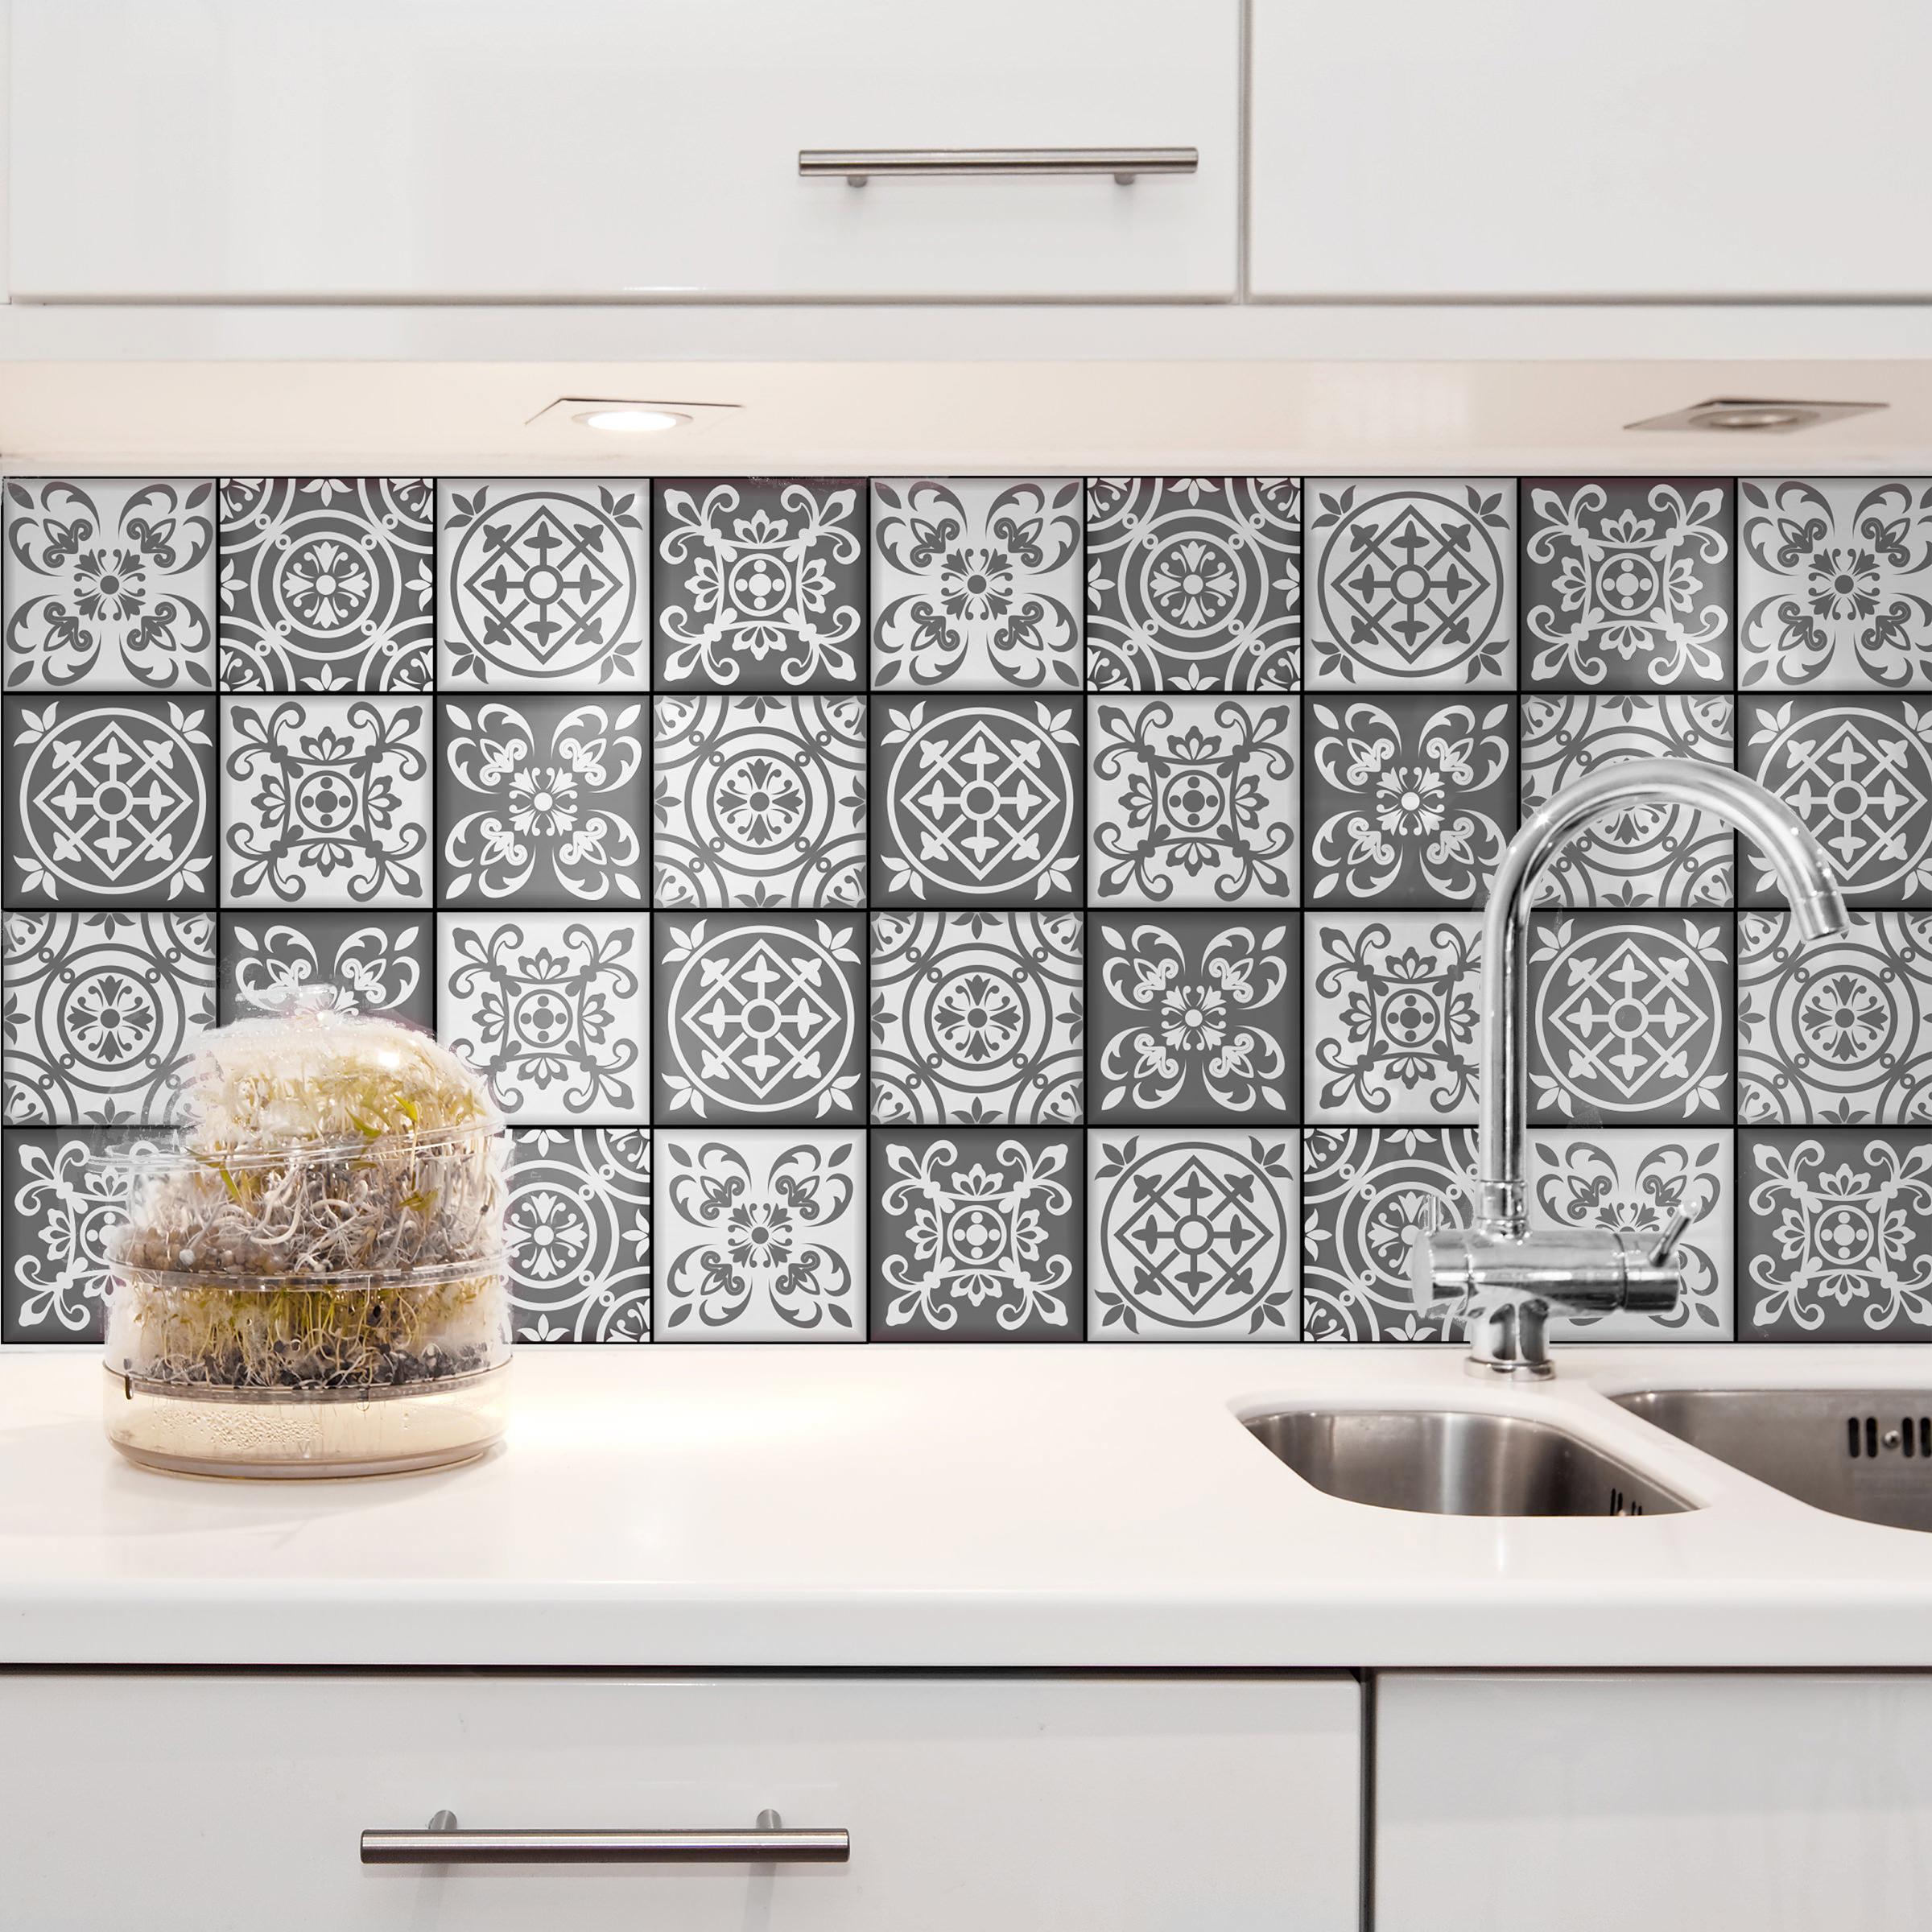 adesivo azulejo 20x20 cinza branco 24un quartinhos elo7